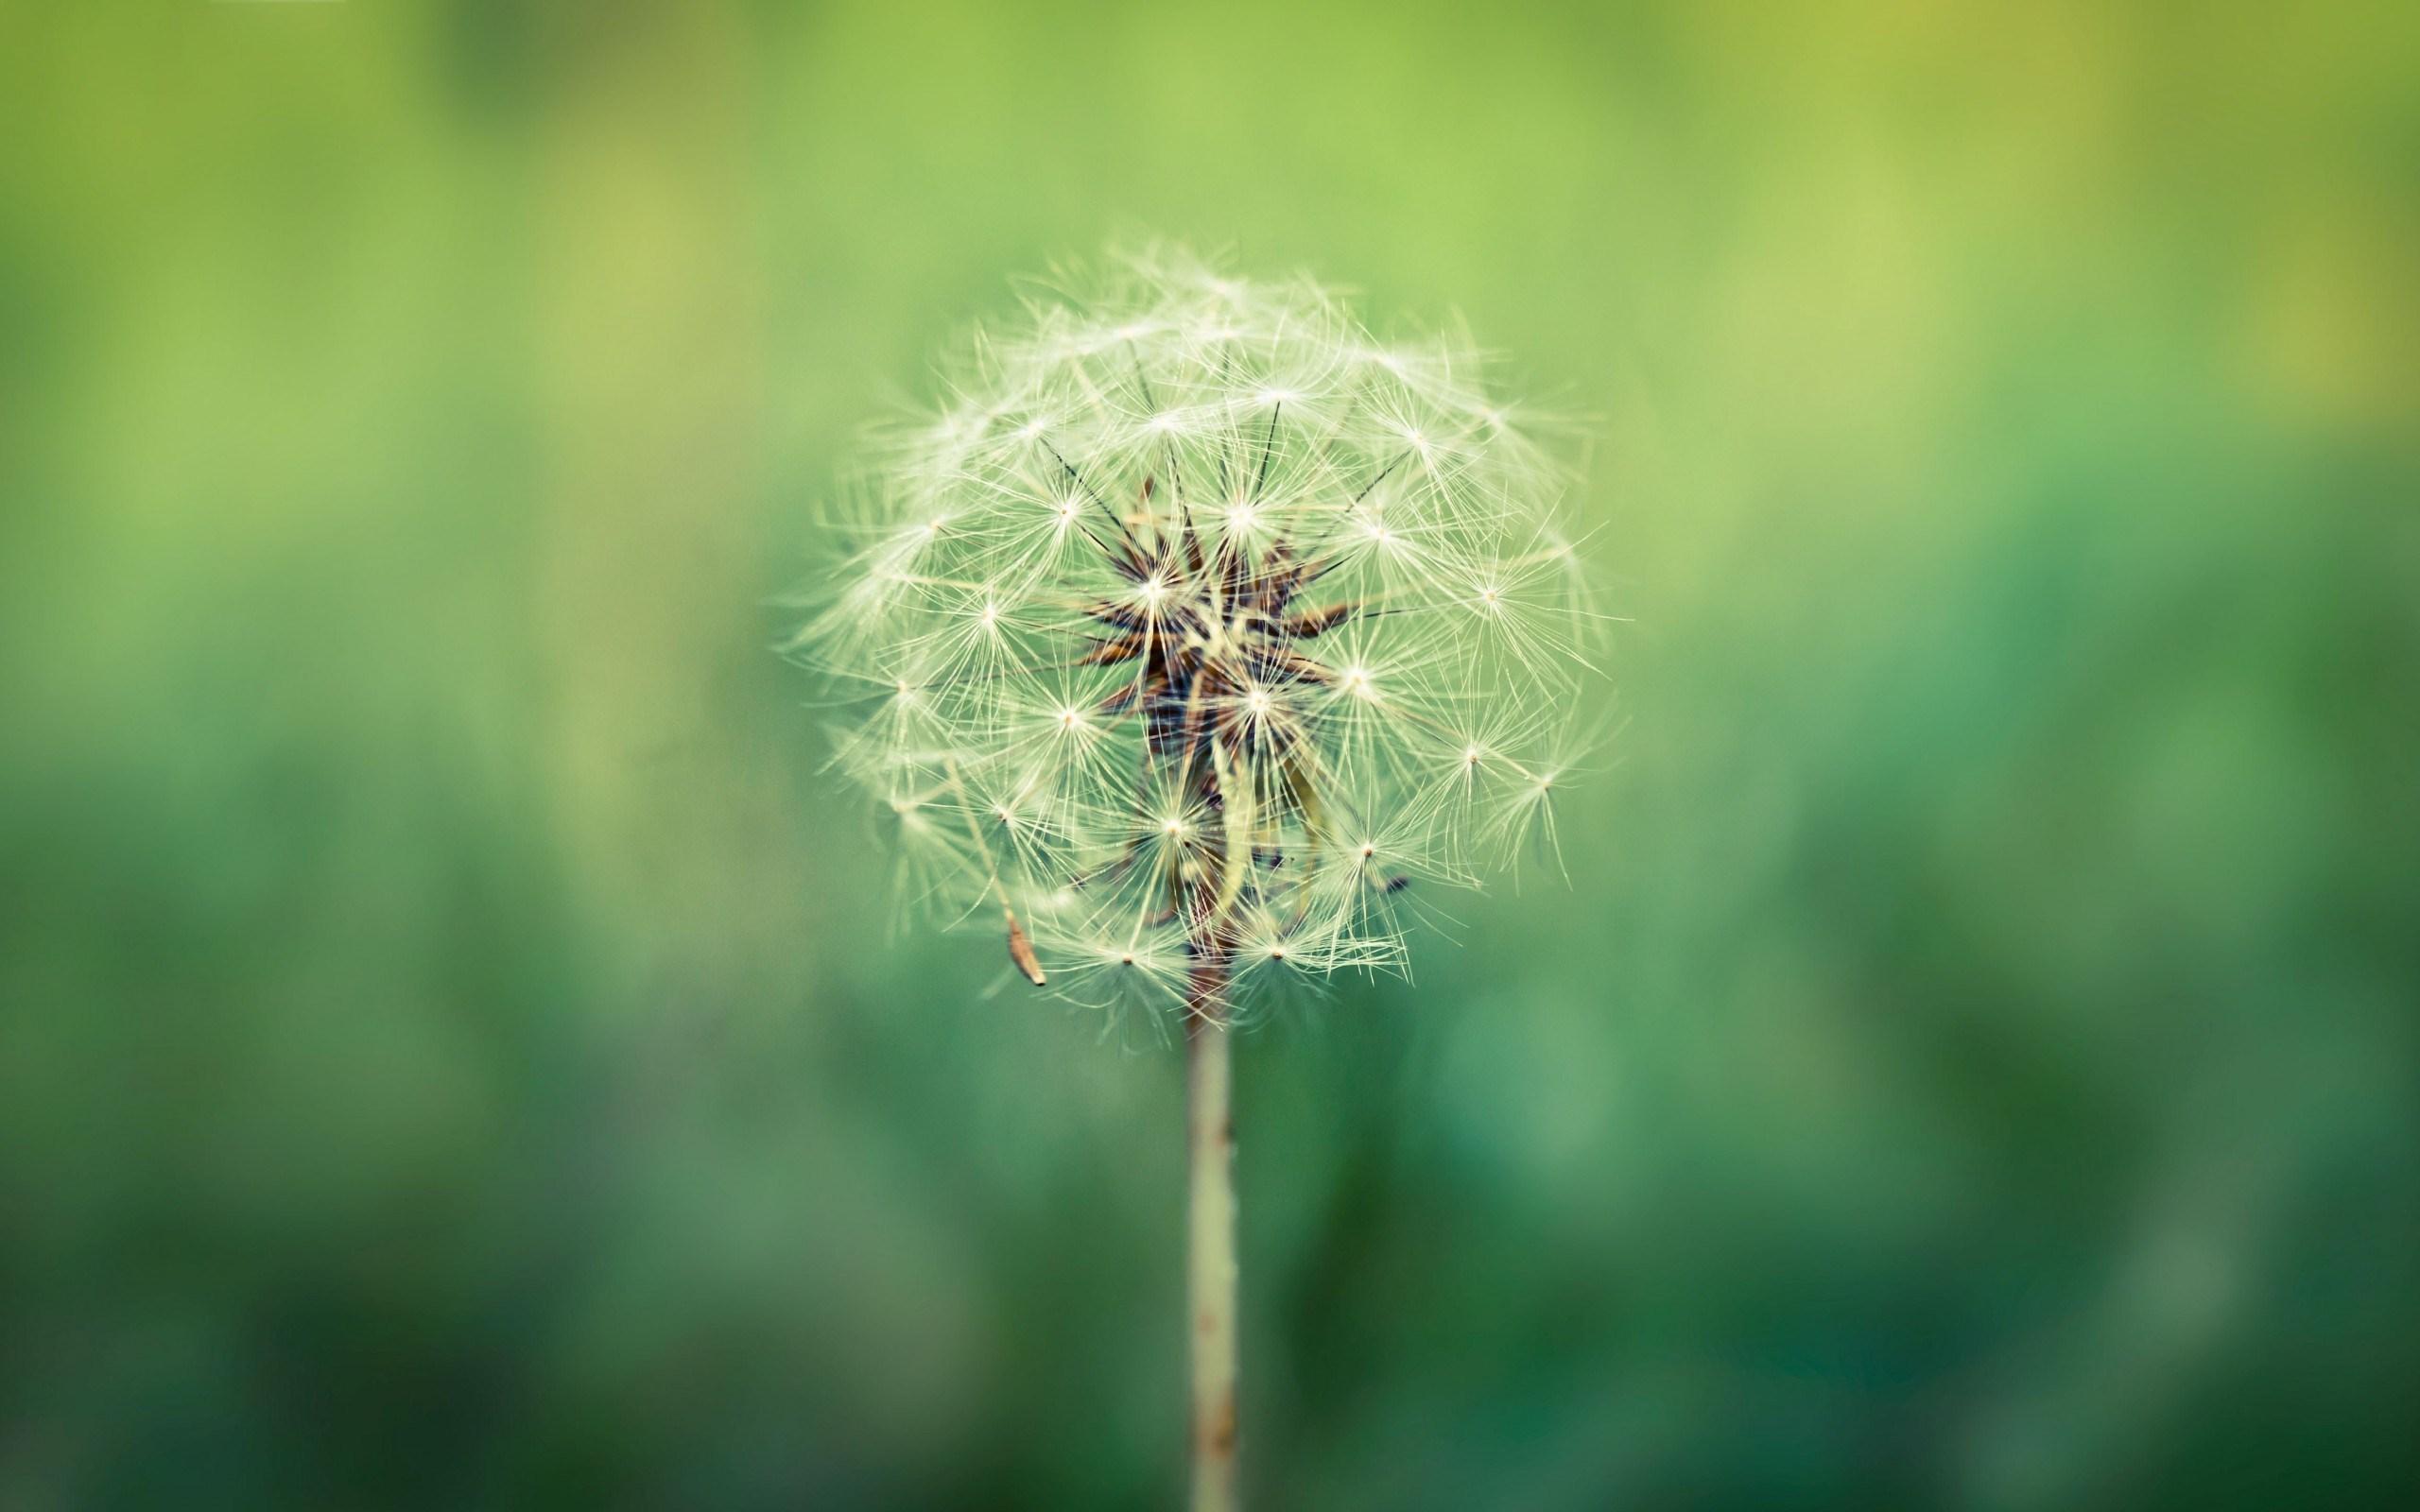 dandelion free download